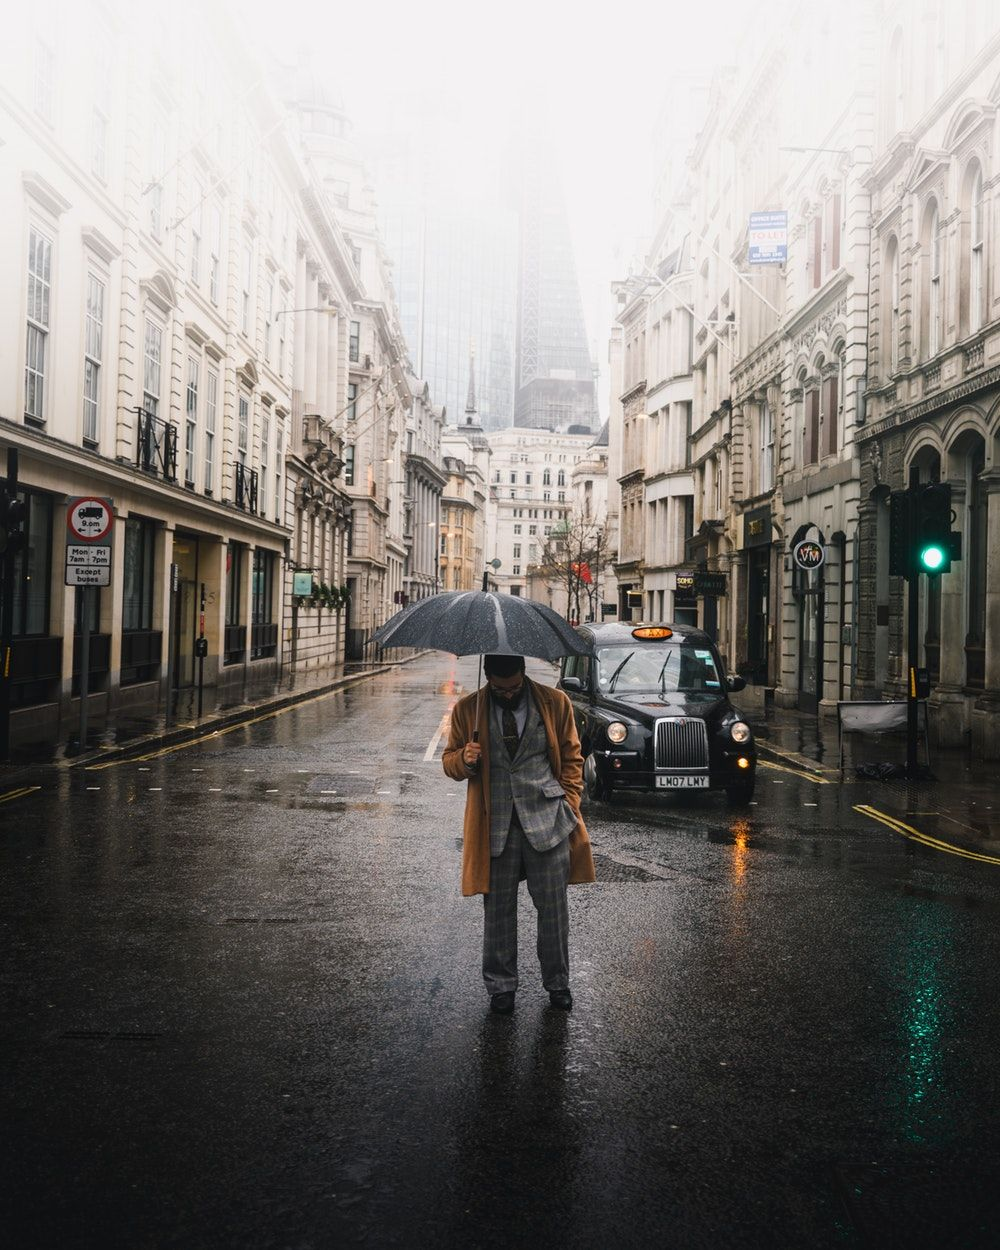 Rainy City Wallpapers - Top Free Rainy City Backgrounds ...